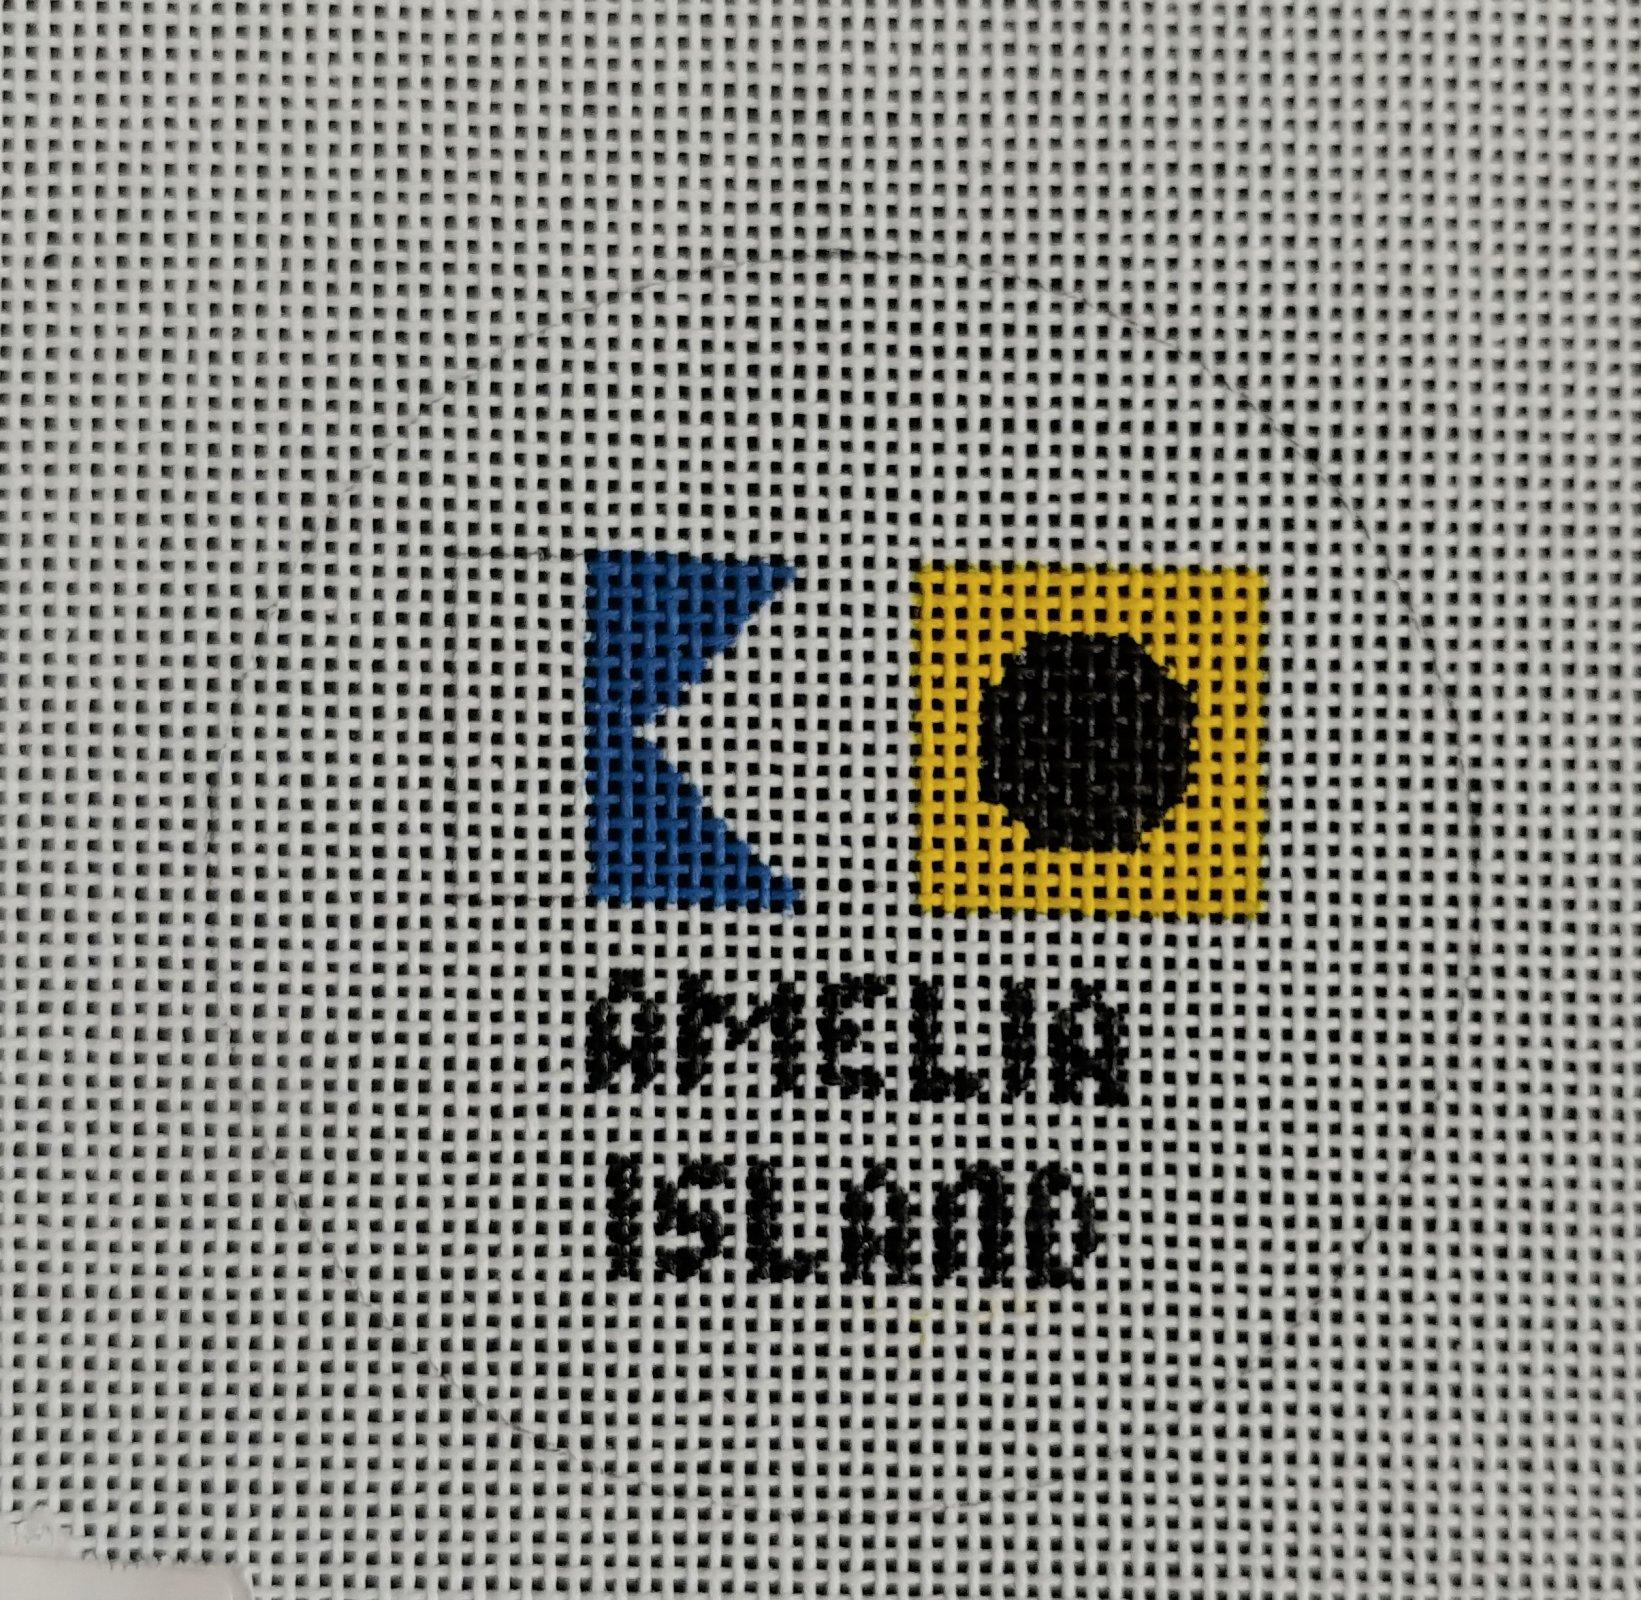 NT043 AMELIA ISLAND